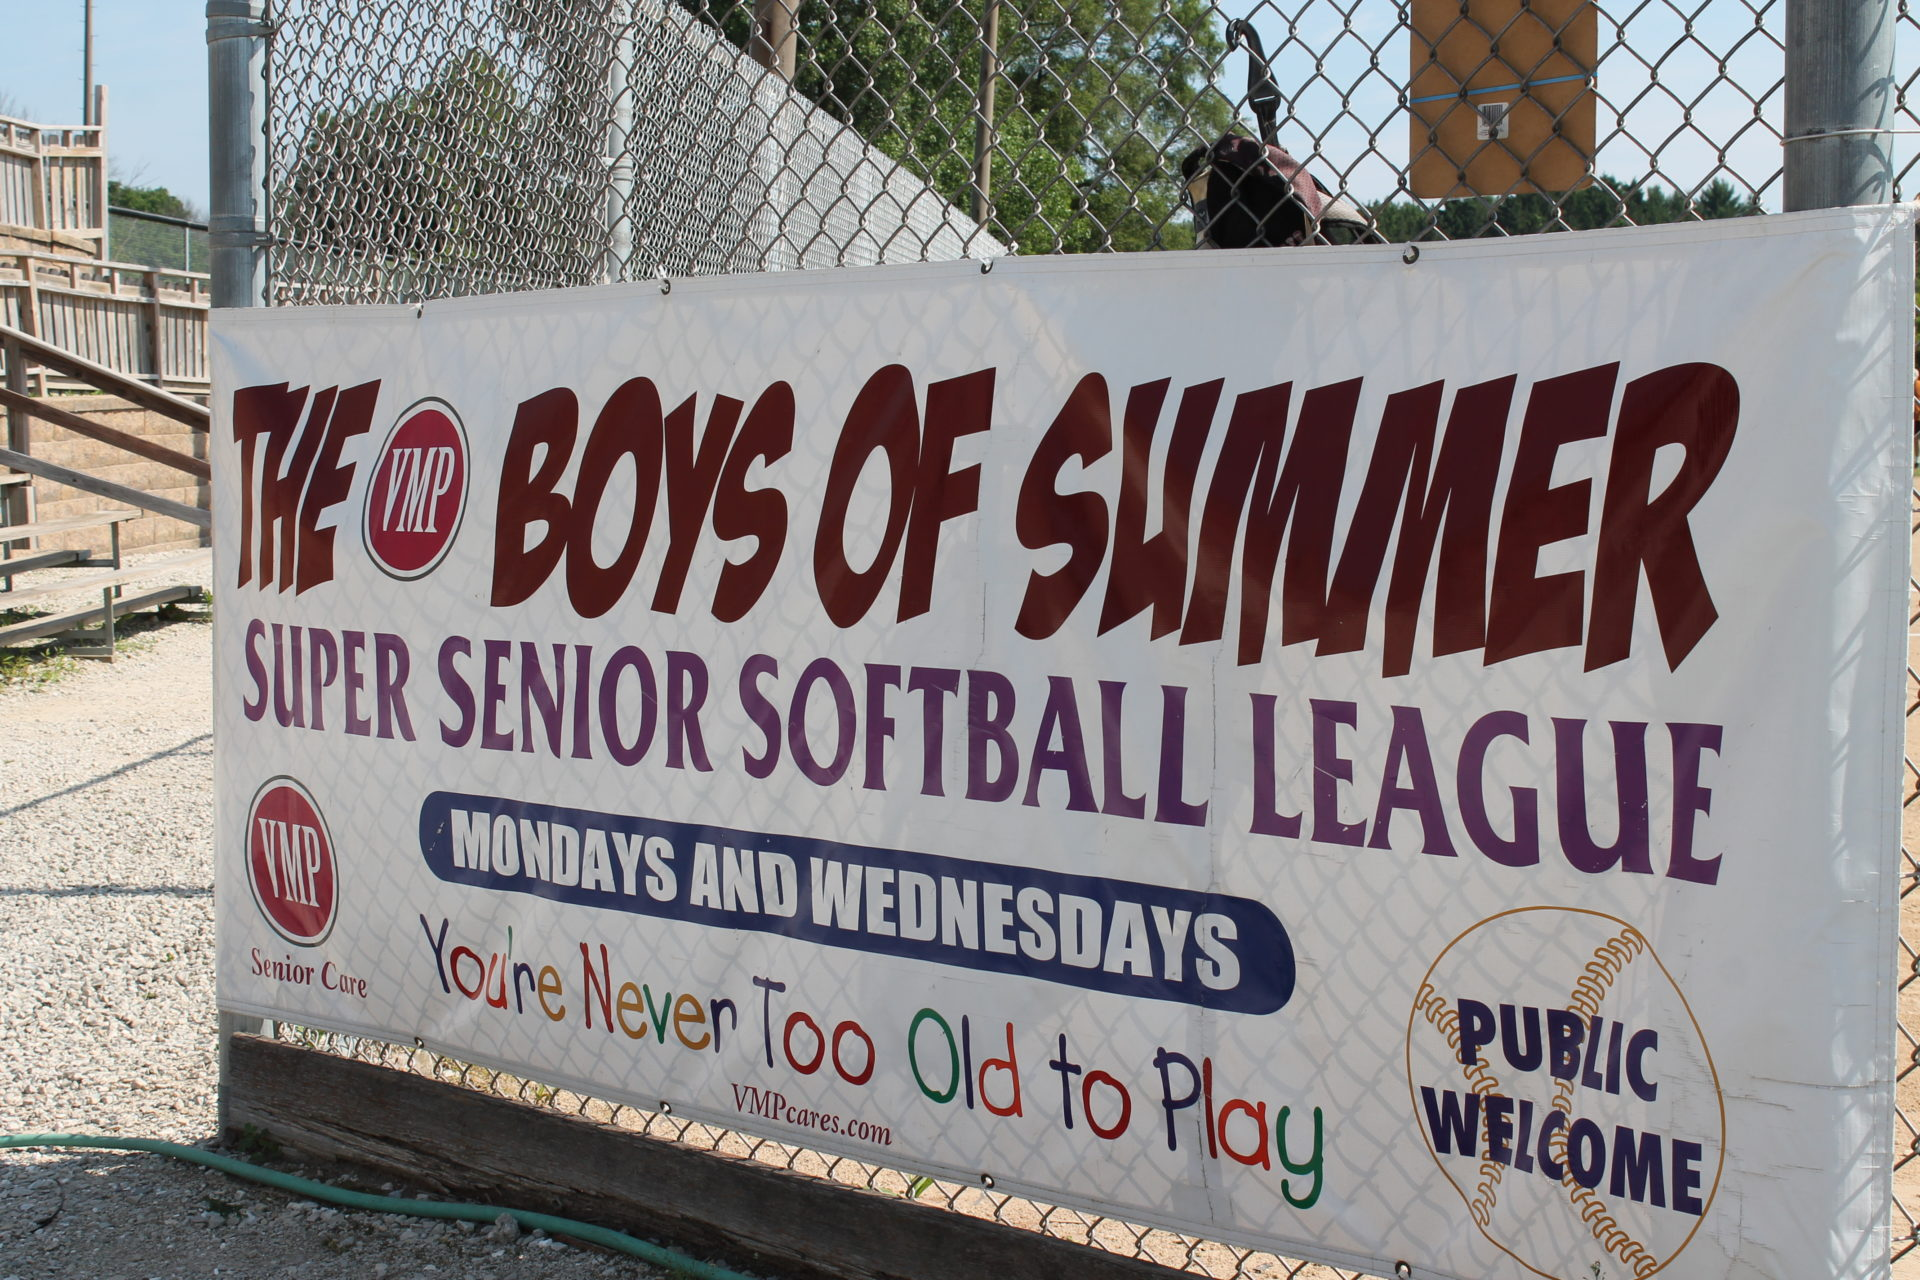 The VMP boys of summer senior softball league banner.